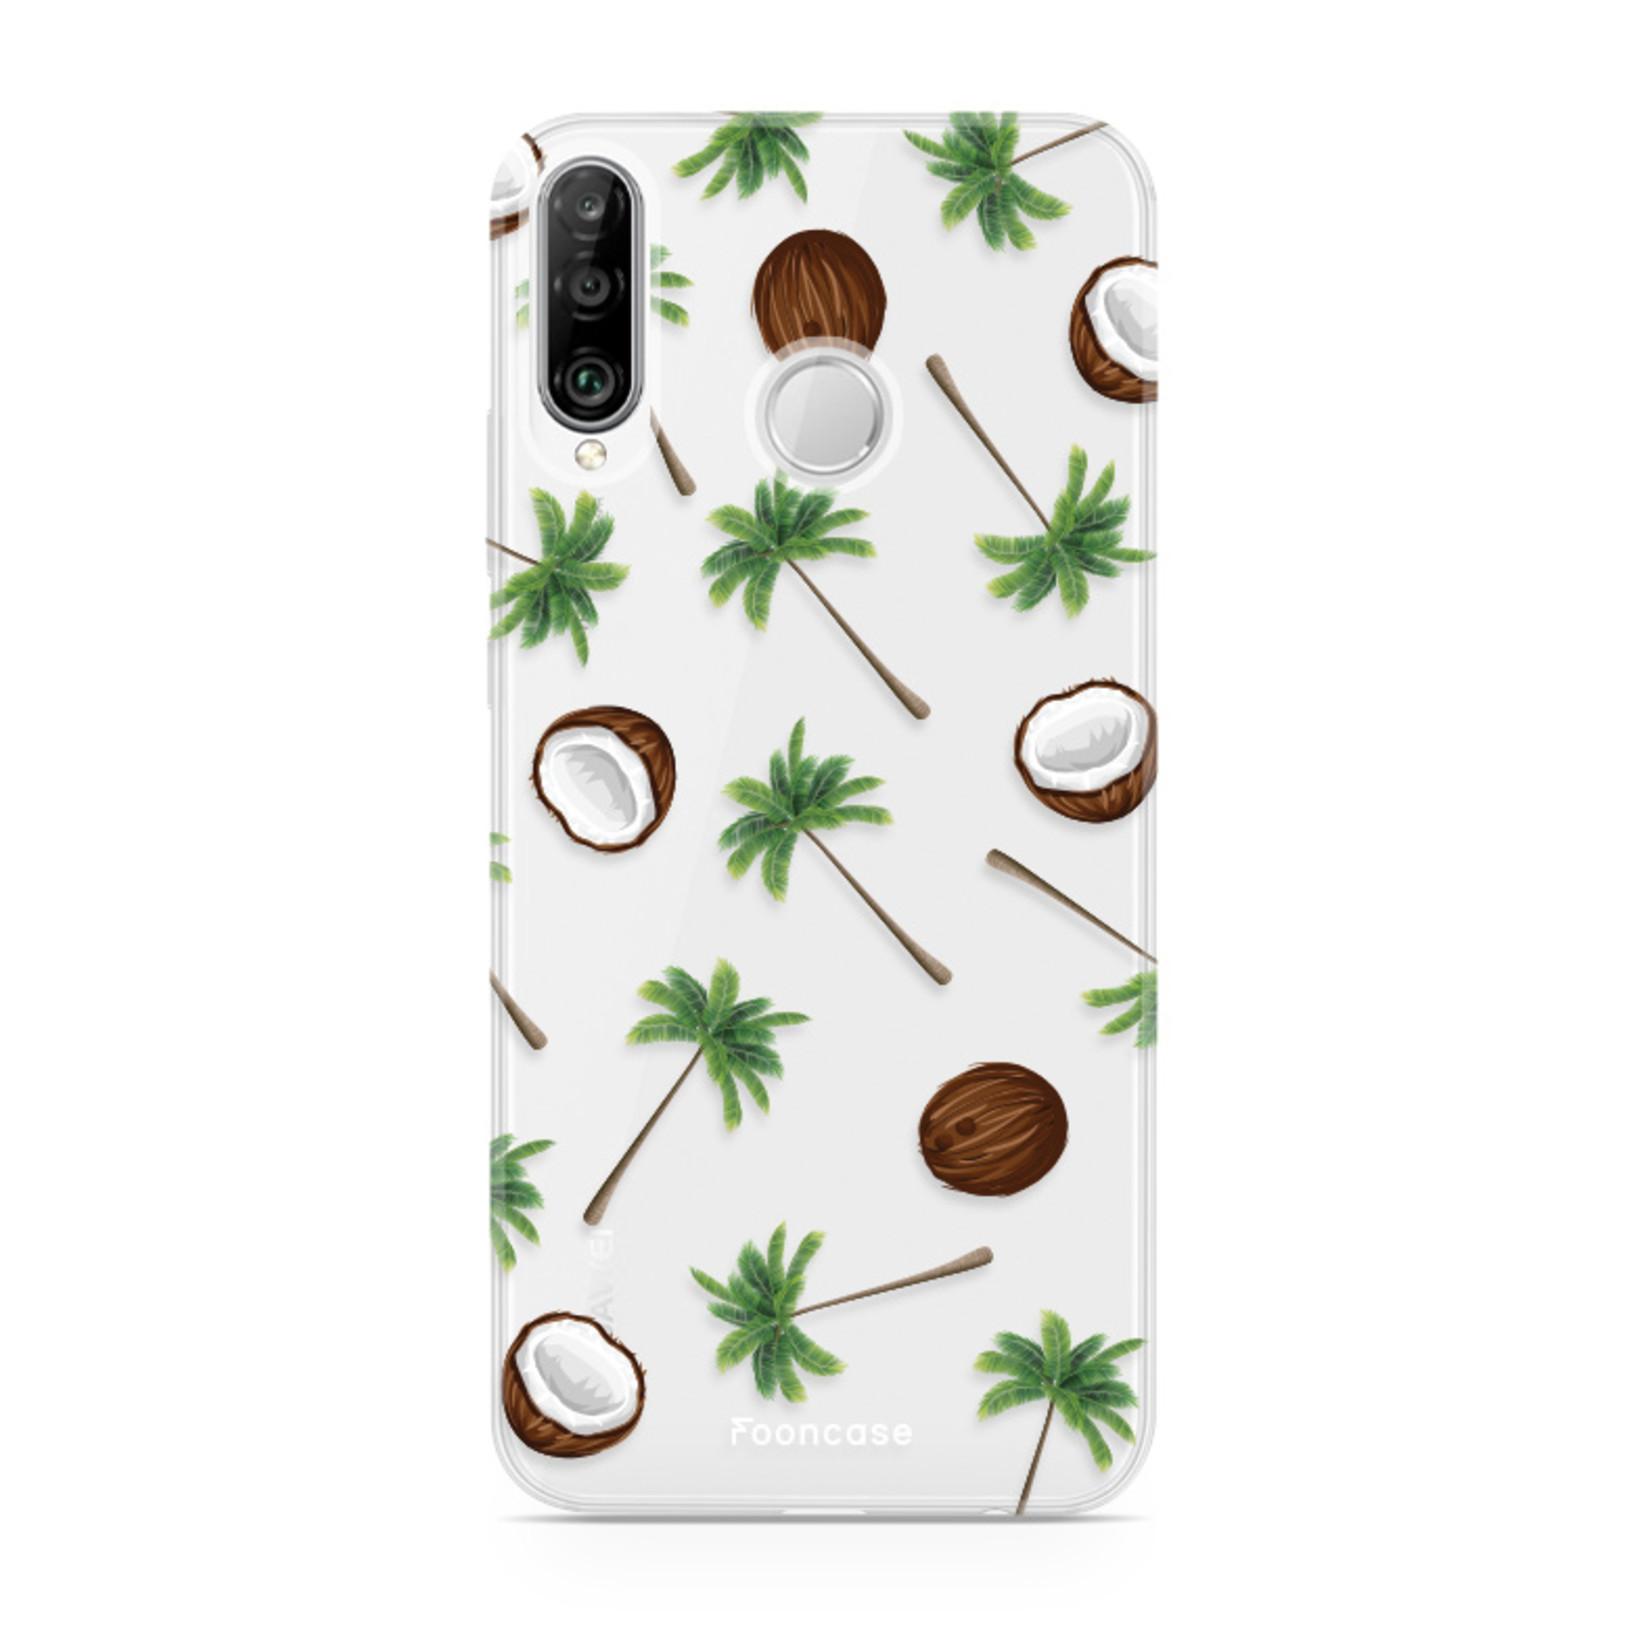 FOONCASE Huawei P30 Lite Handyhülle - Coco Paradise